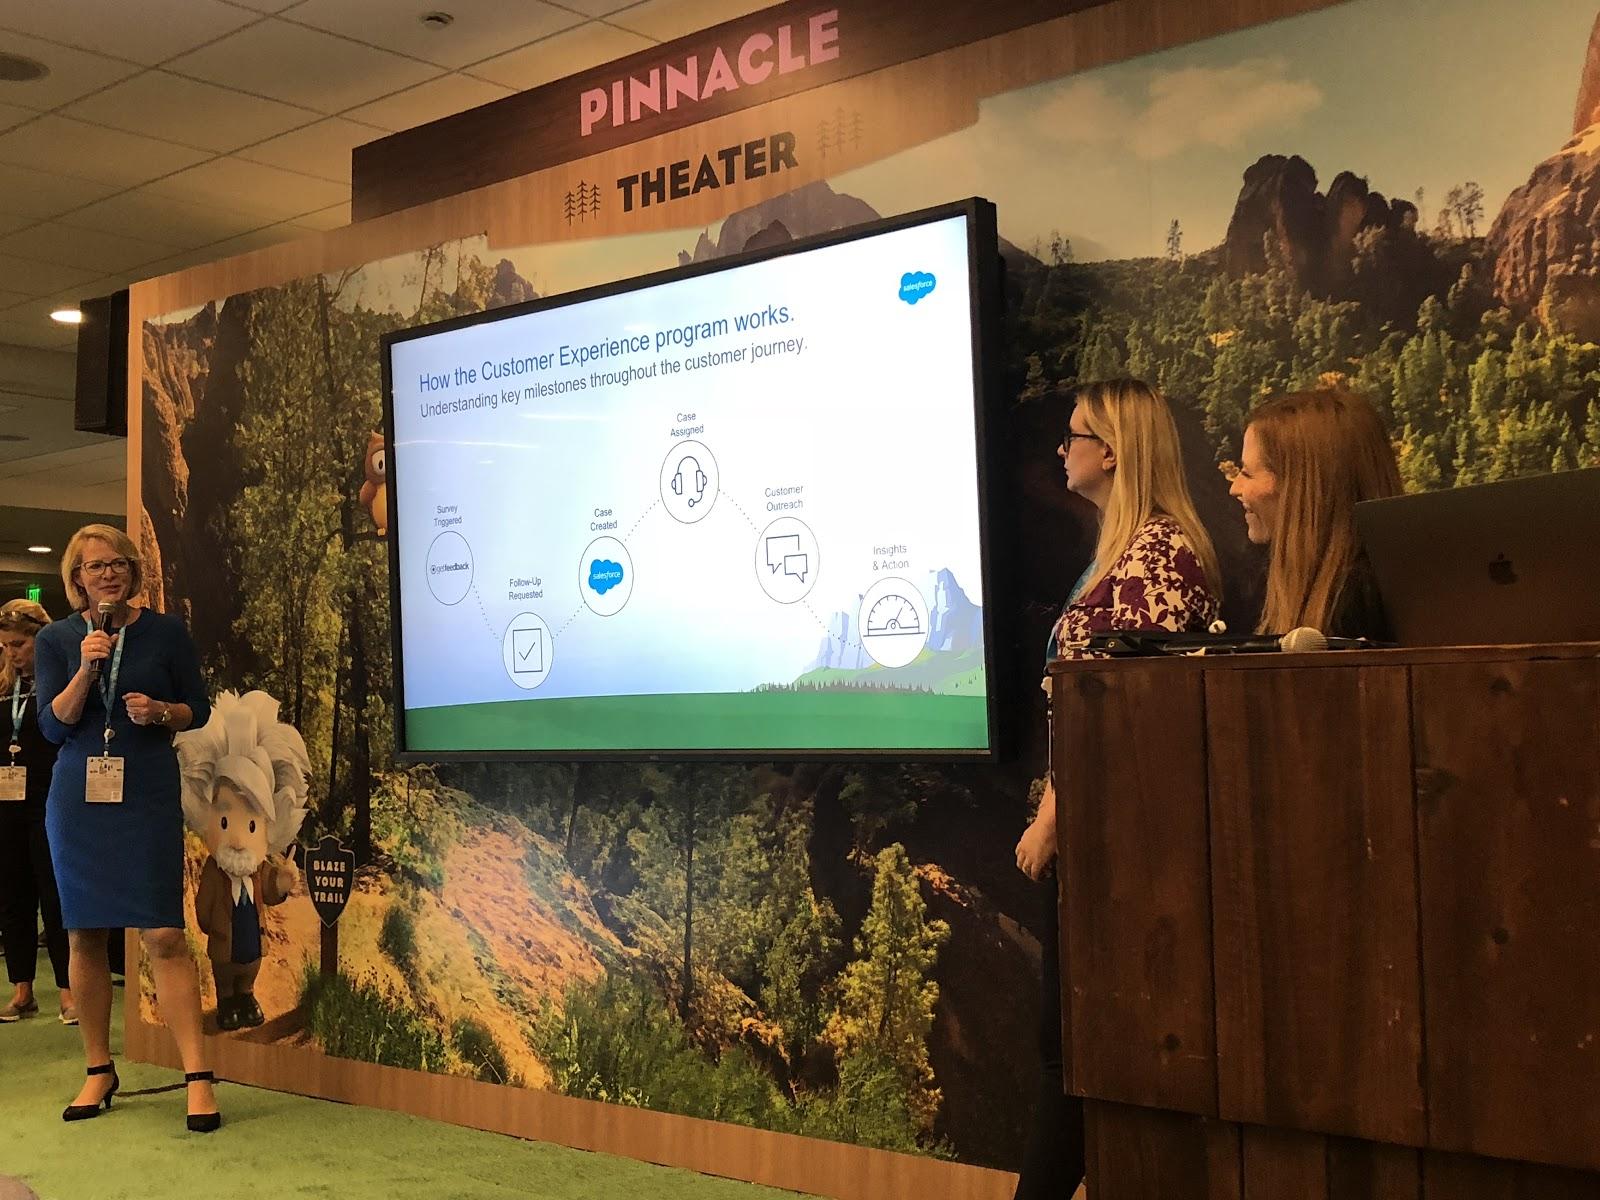 Dreamforce 2018 - Desiree Hanlon - Director of Customer Success, GetFeedback & Megan Burton - Sr. Director, Customer Experience, Salesforce & Kelly Spillson - Sr. Strategist, Customer Experience, Salesforce